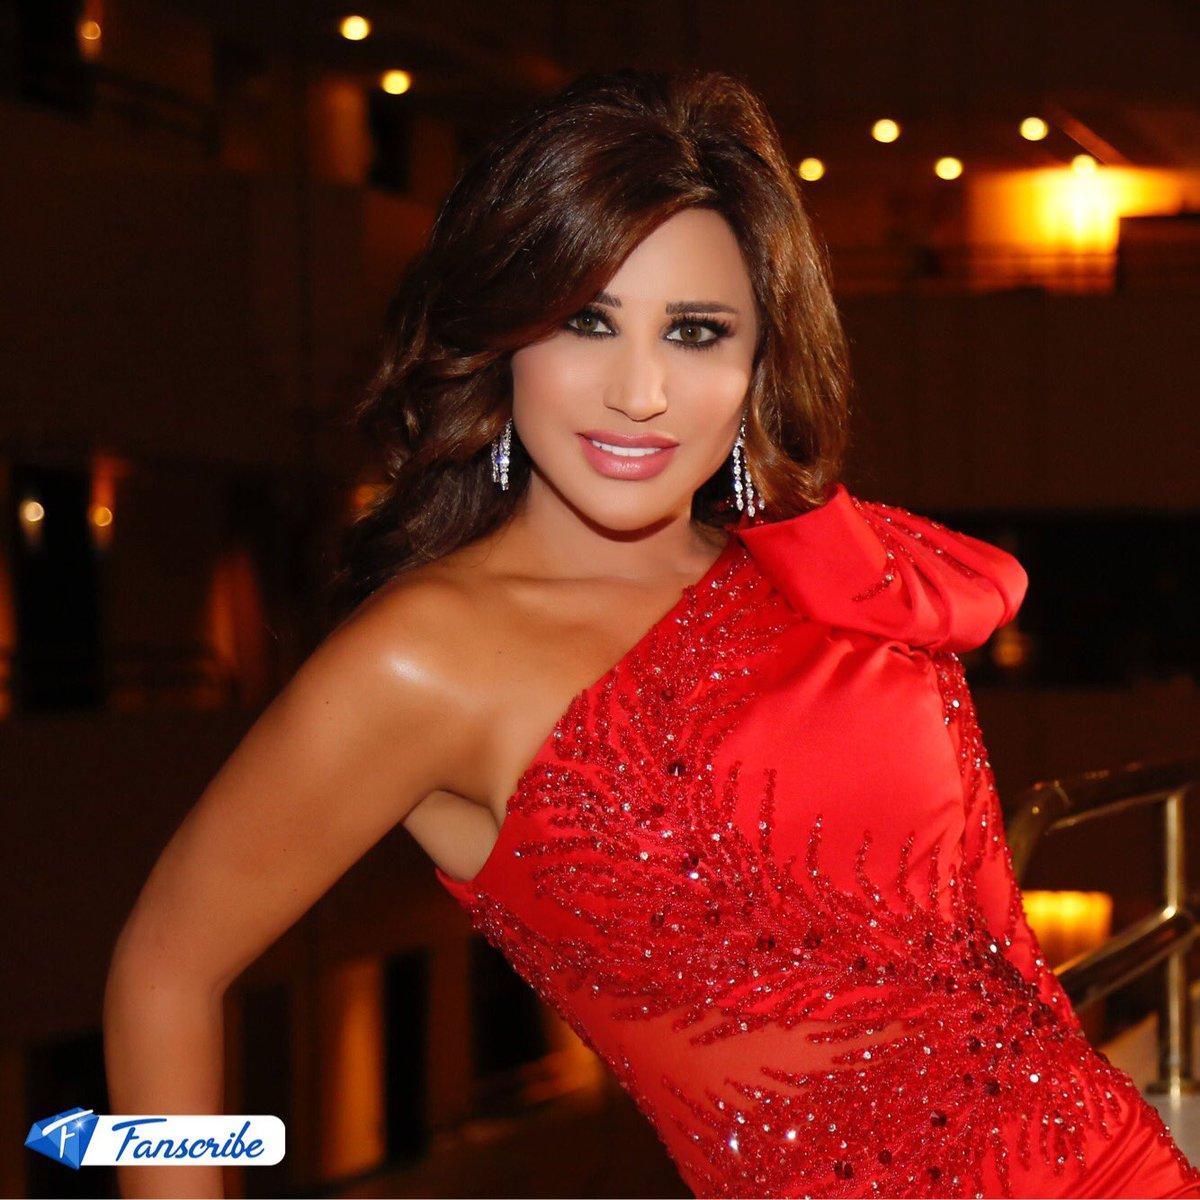 Bisara7a Com بصراحة On Twitter بالصور نجوى كرم تتألق بالاحمر في